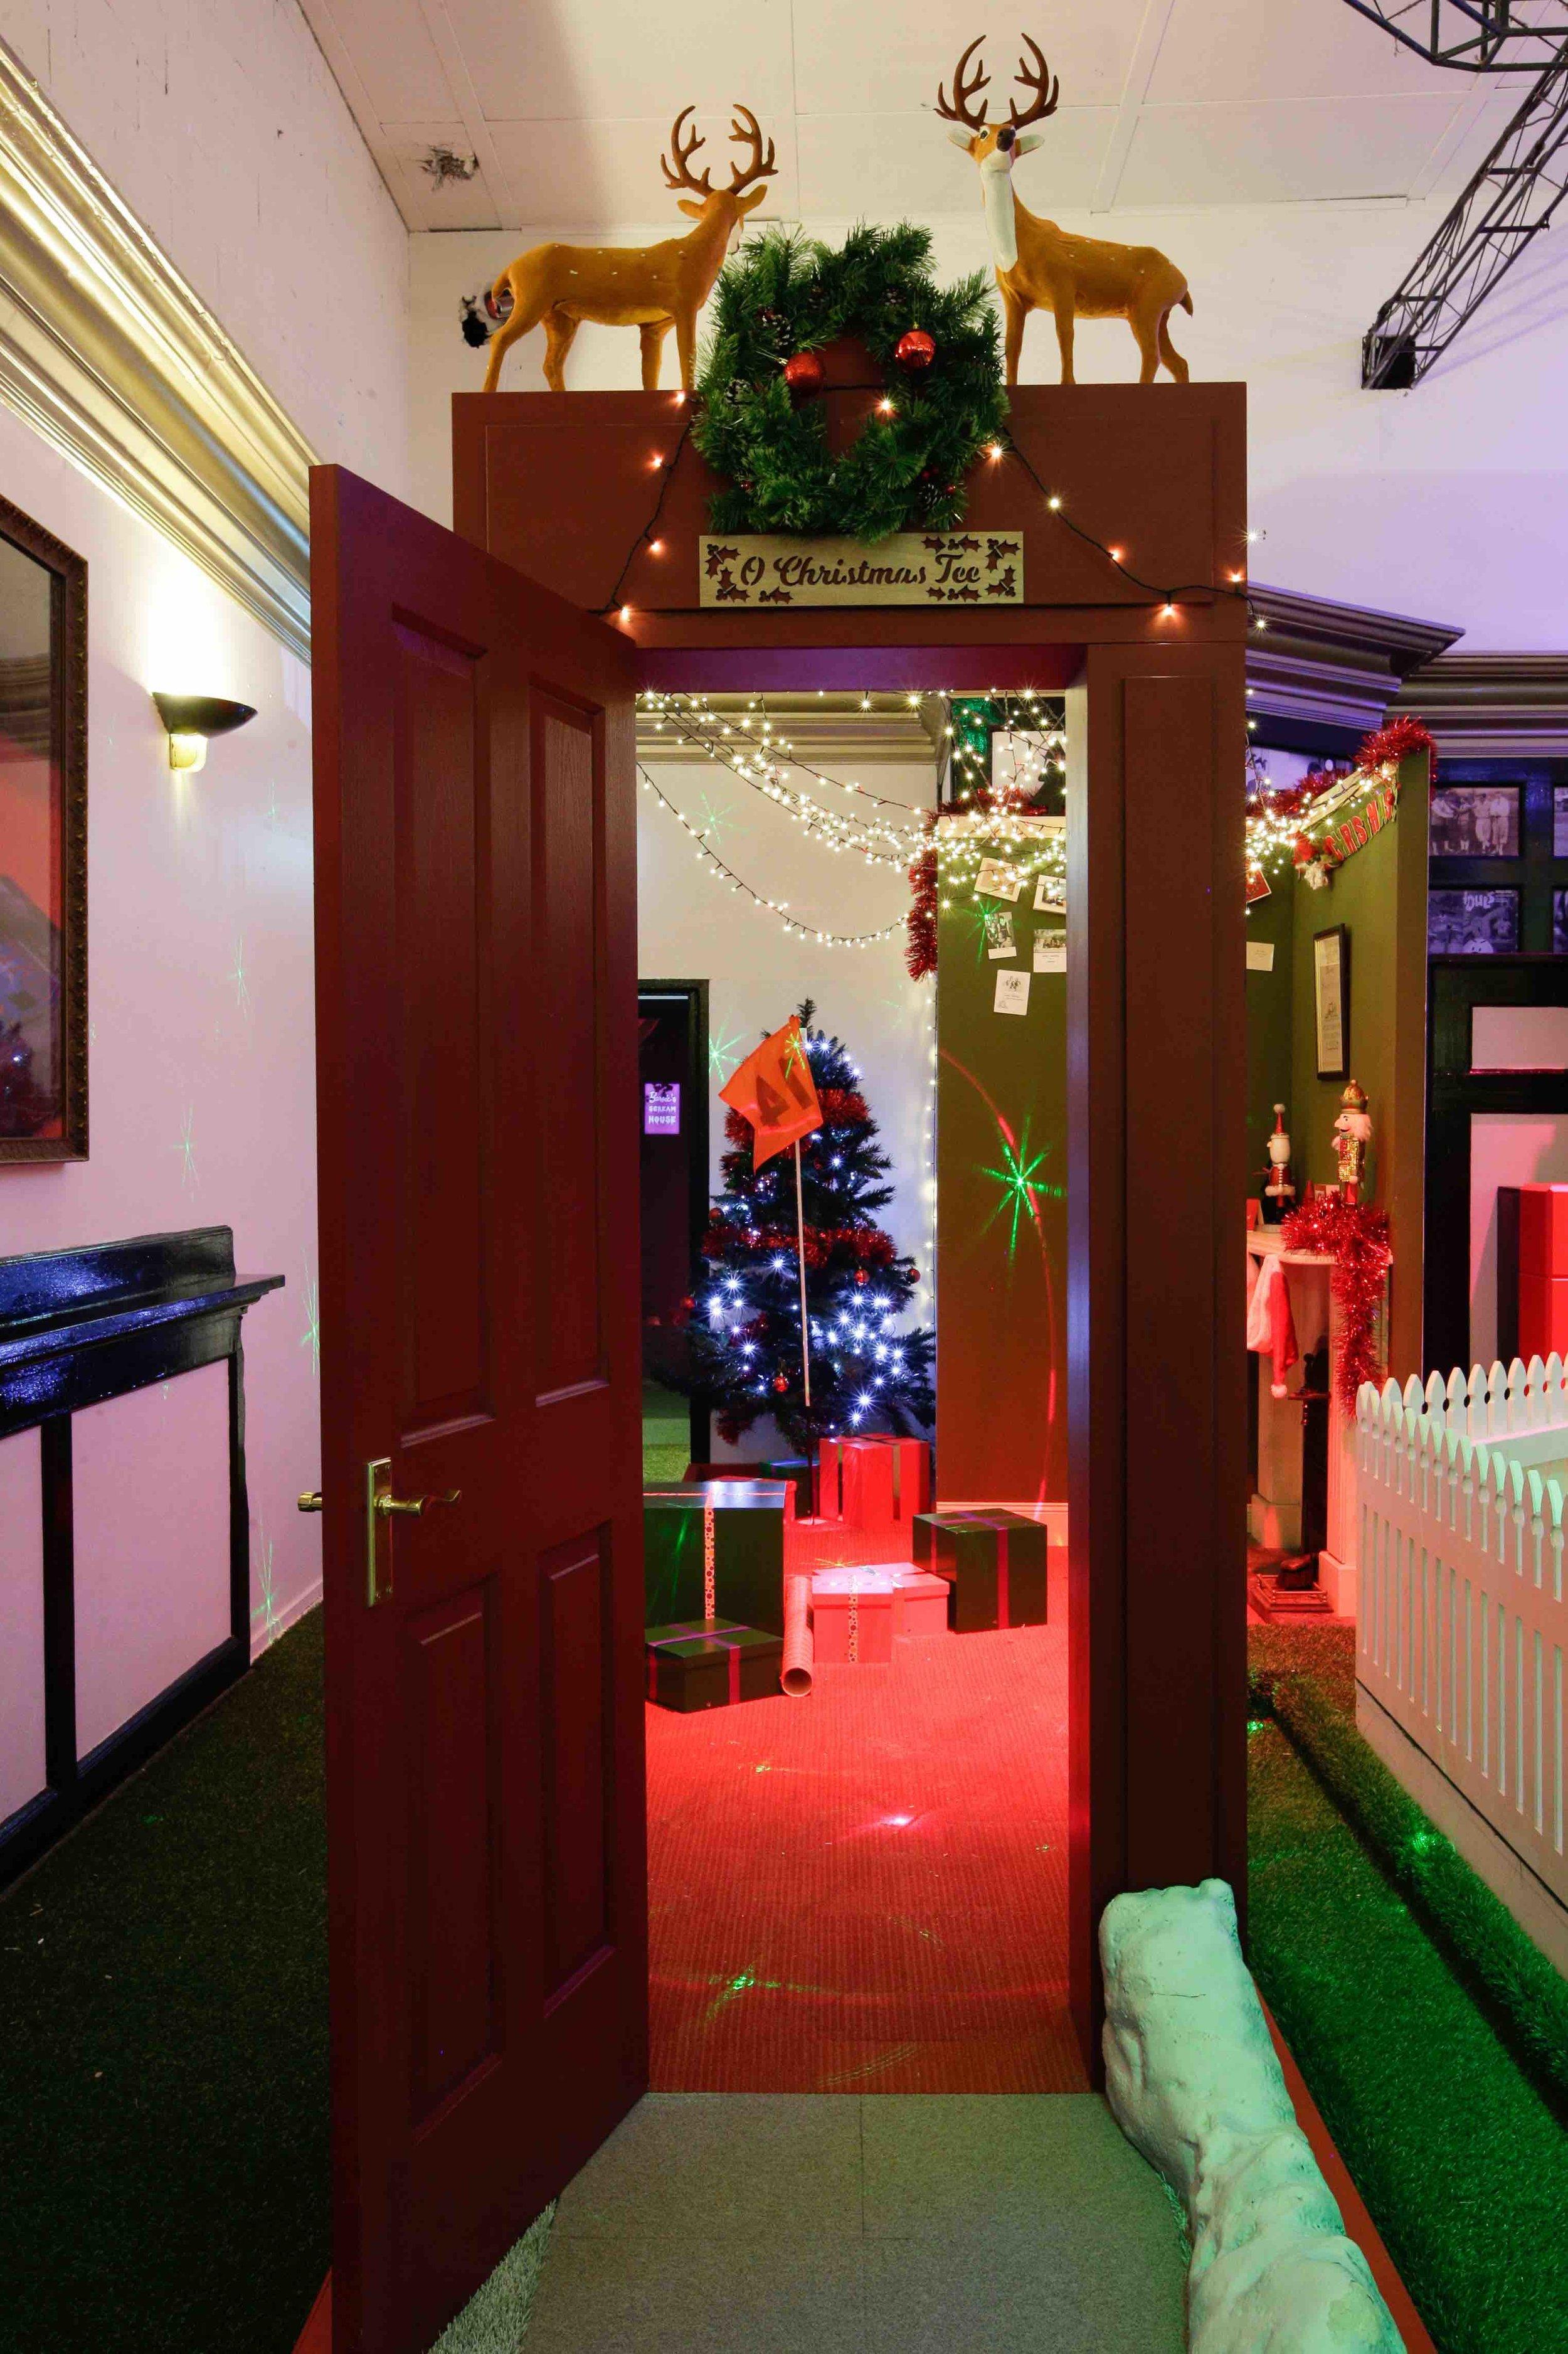 holey-moley-golf-club-launch-2017-interior-o-christmas-tree-1.jpeg